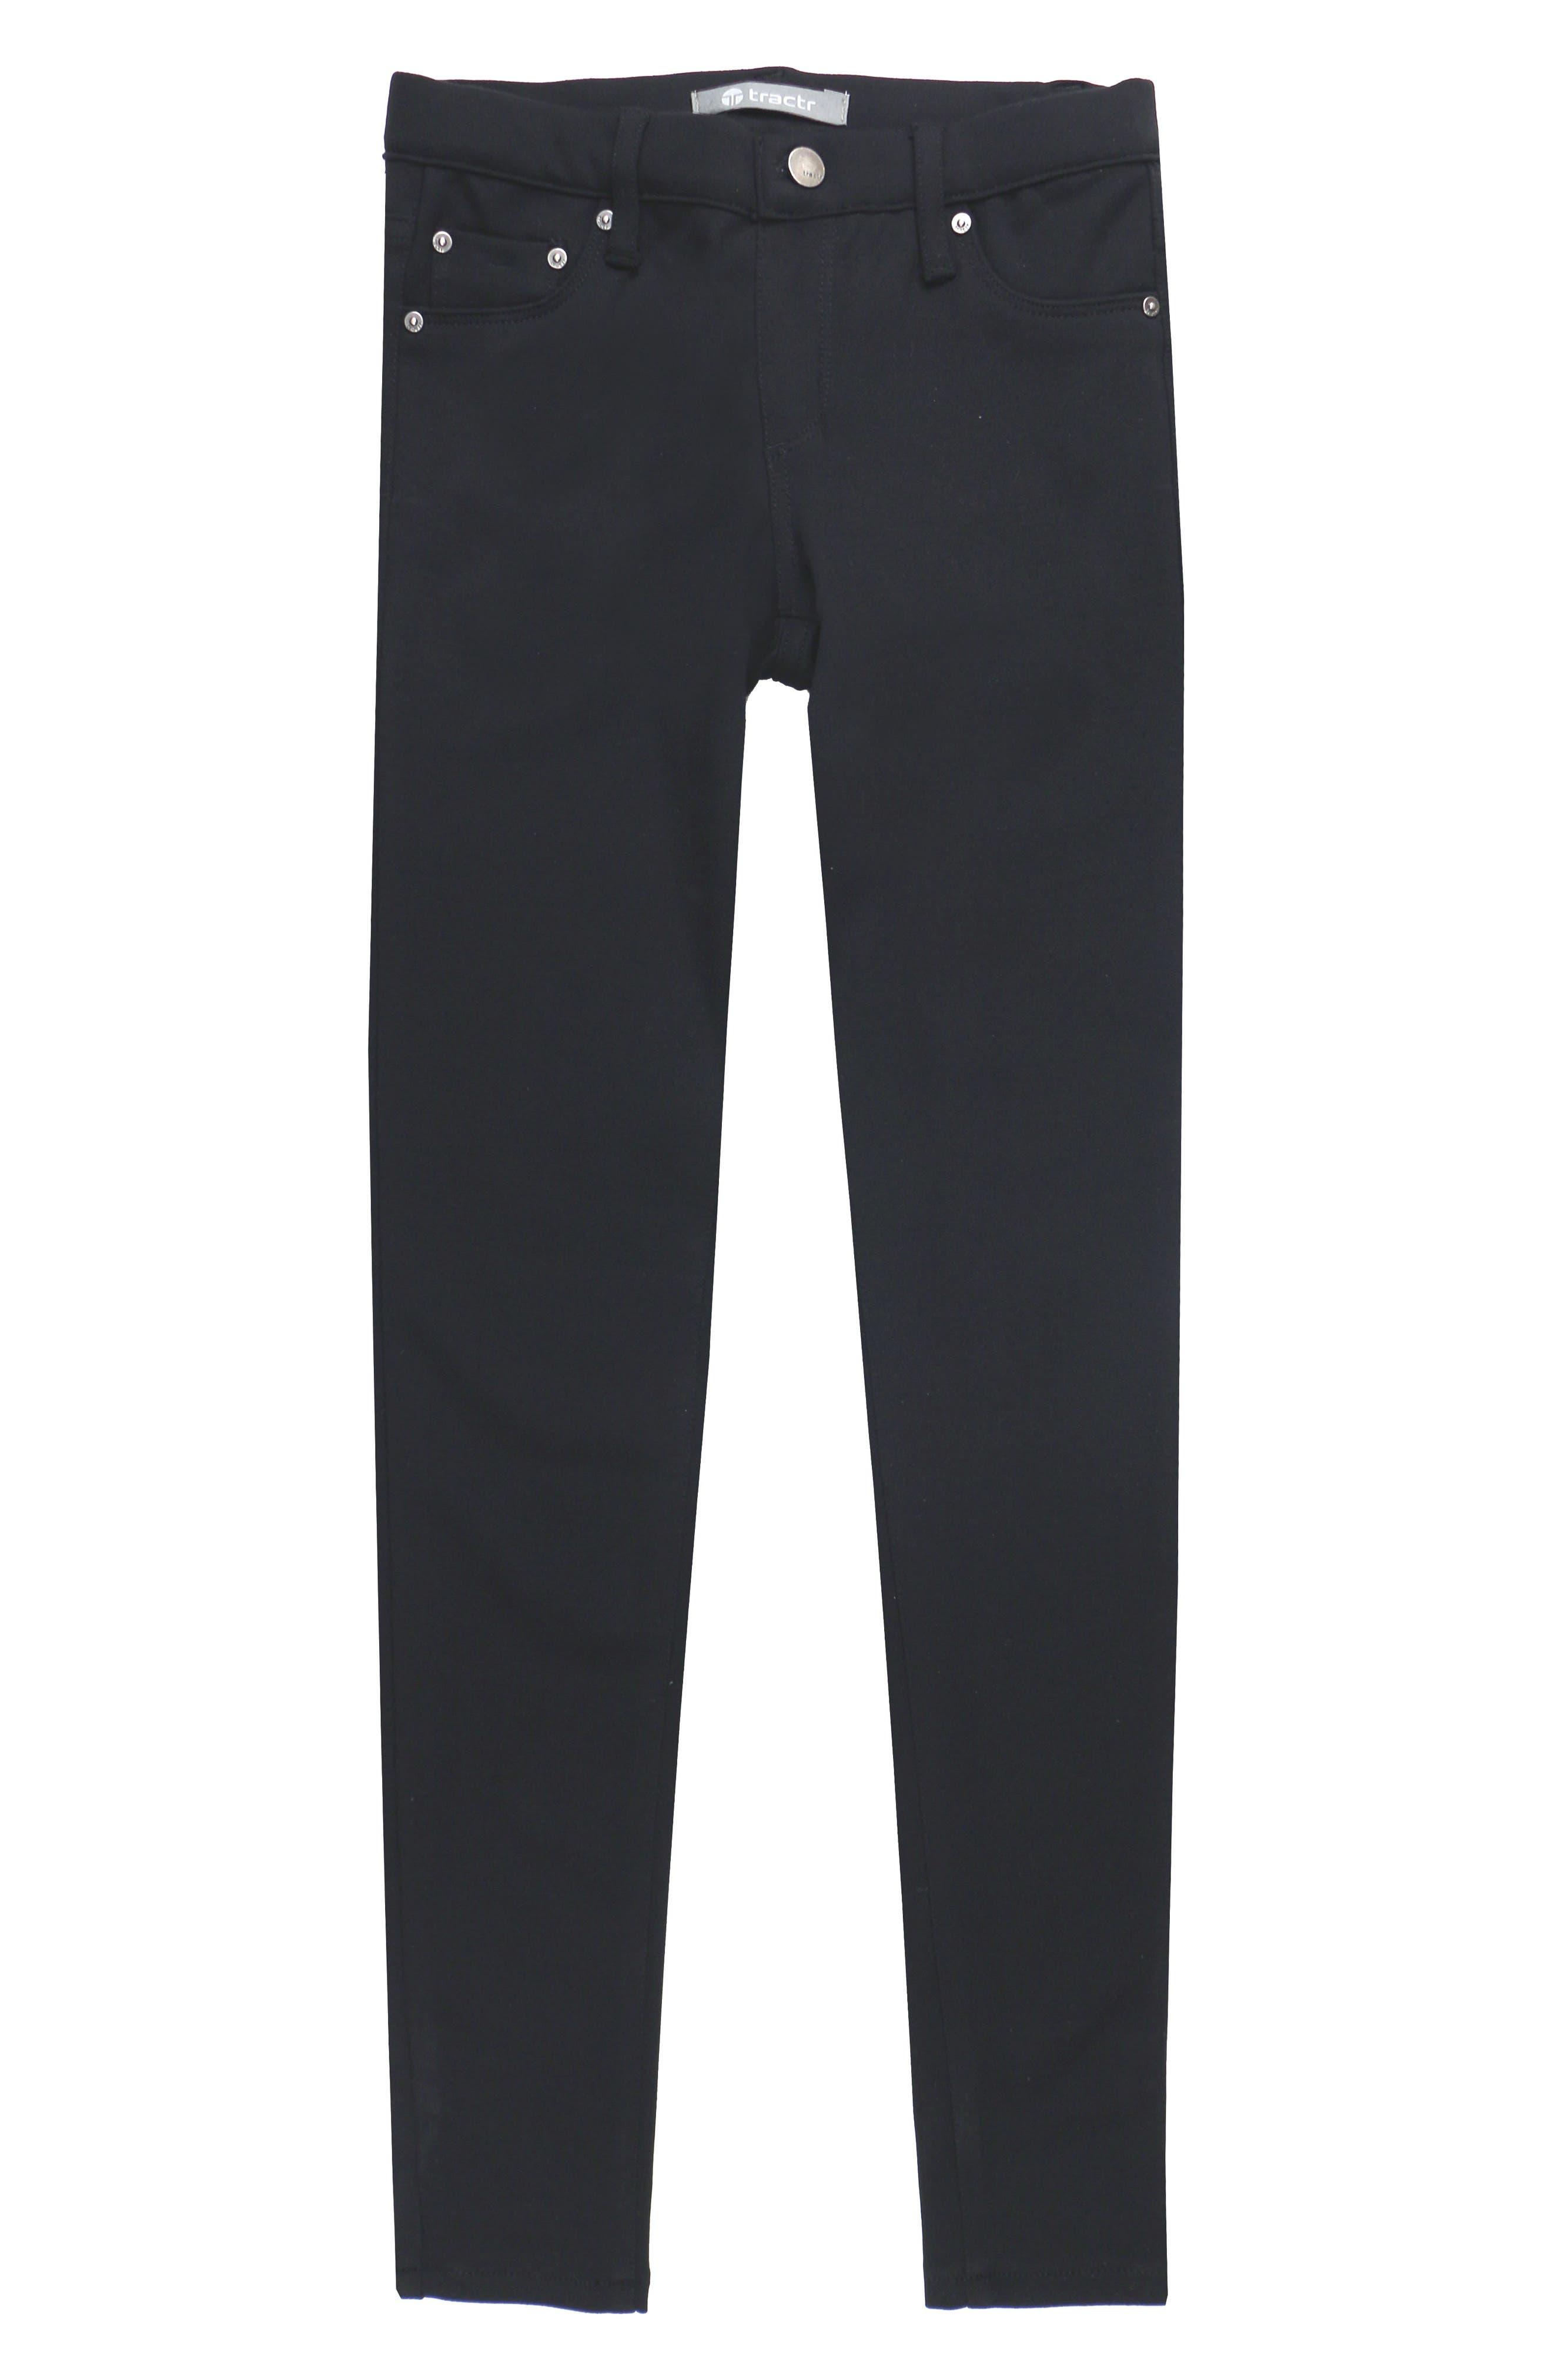 Ponte Knit Skinny Jeans,                             Main thumbnail 1, color,                             001